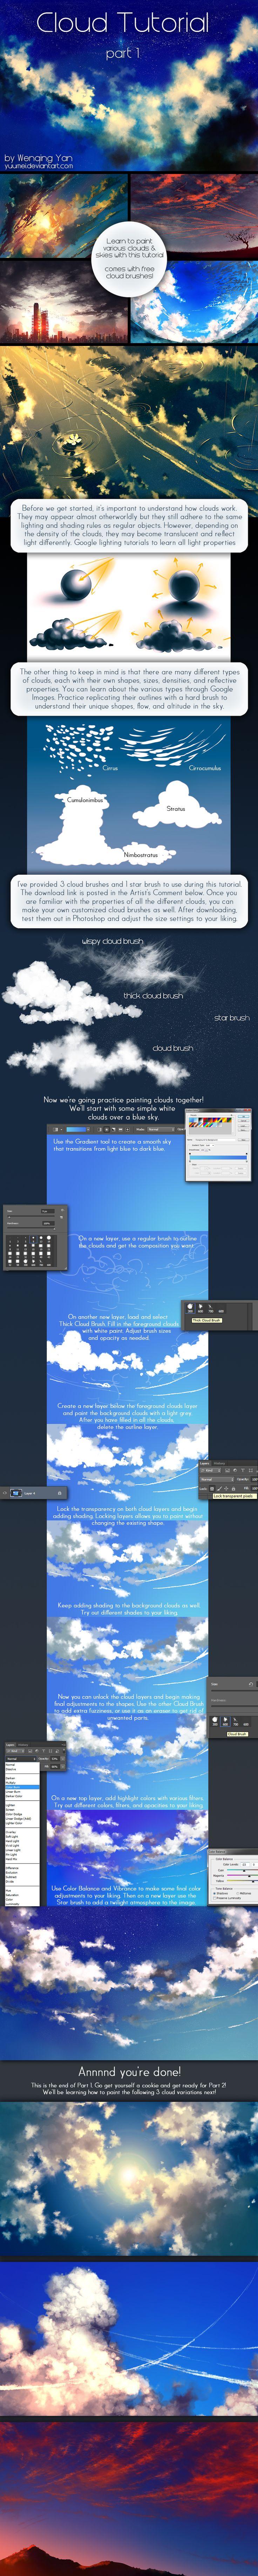 Cloud Tutorial Part 1 by yuumei.deviantart.com on @deviantART